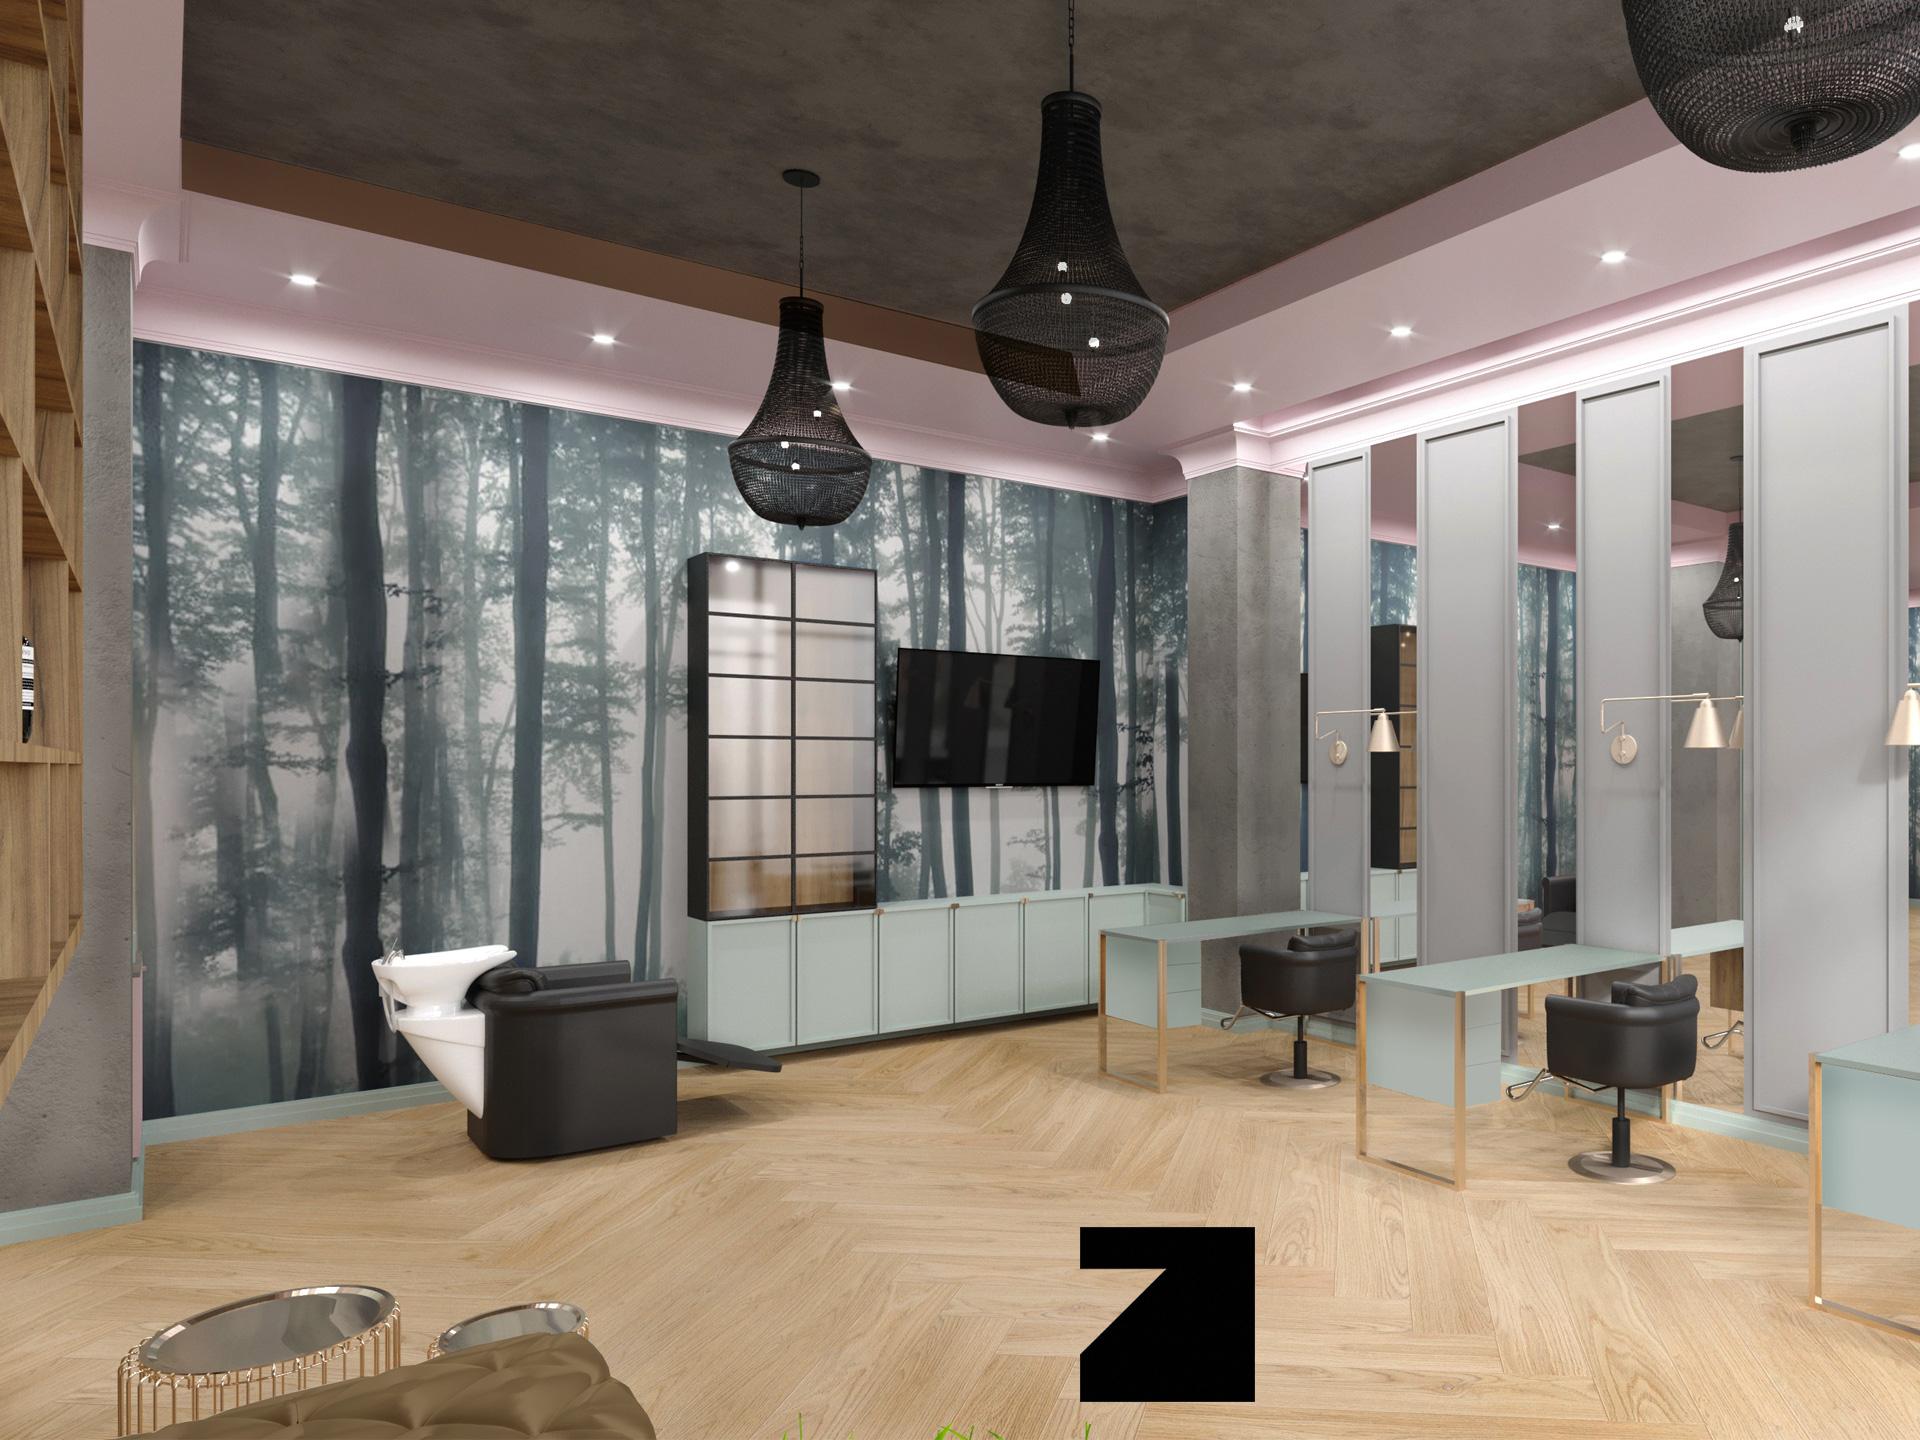 ekskluzywne projekty wnętrz - Lesinska